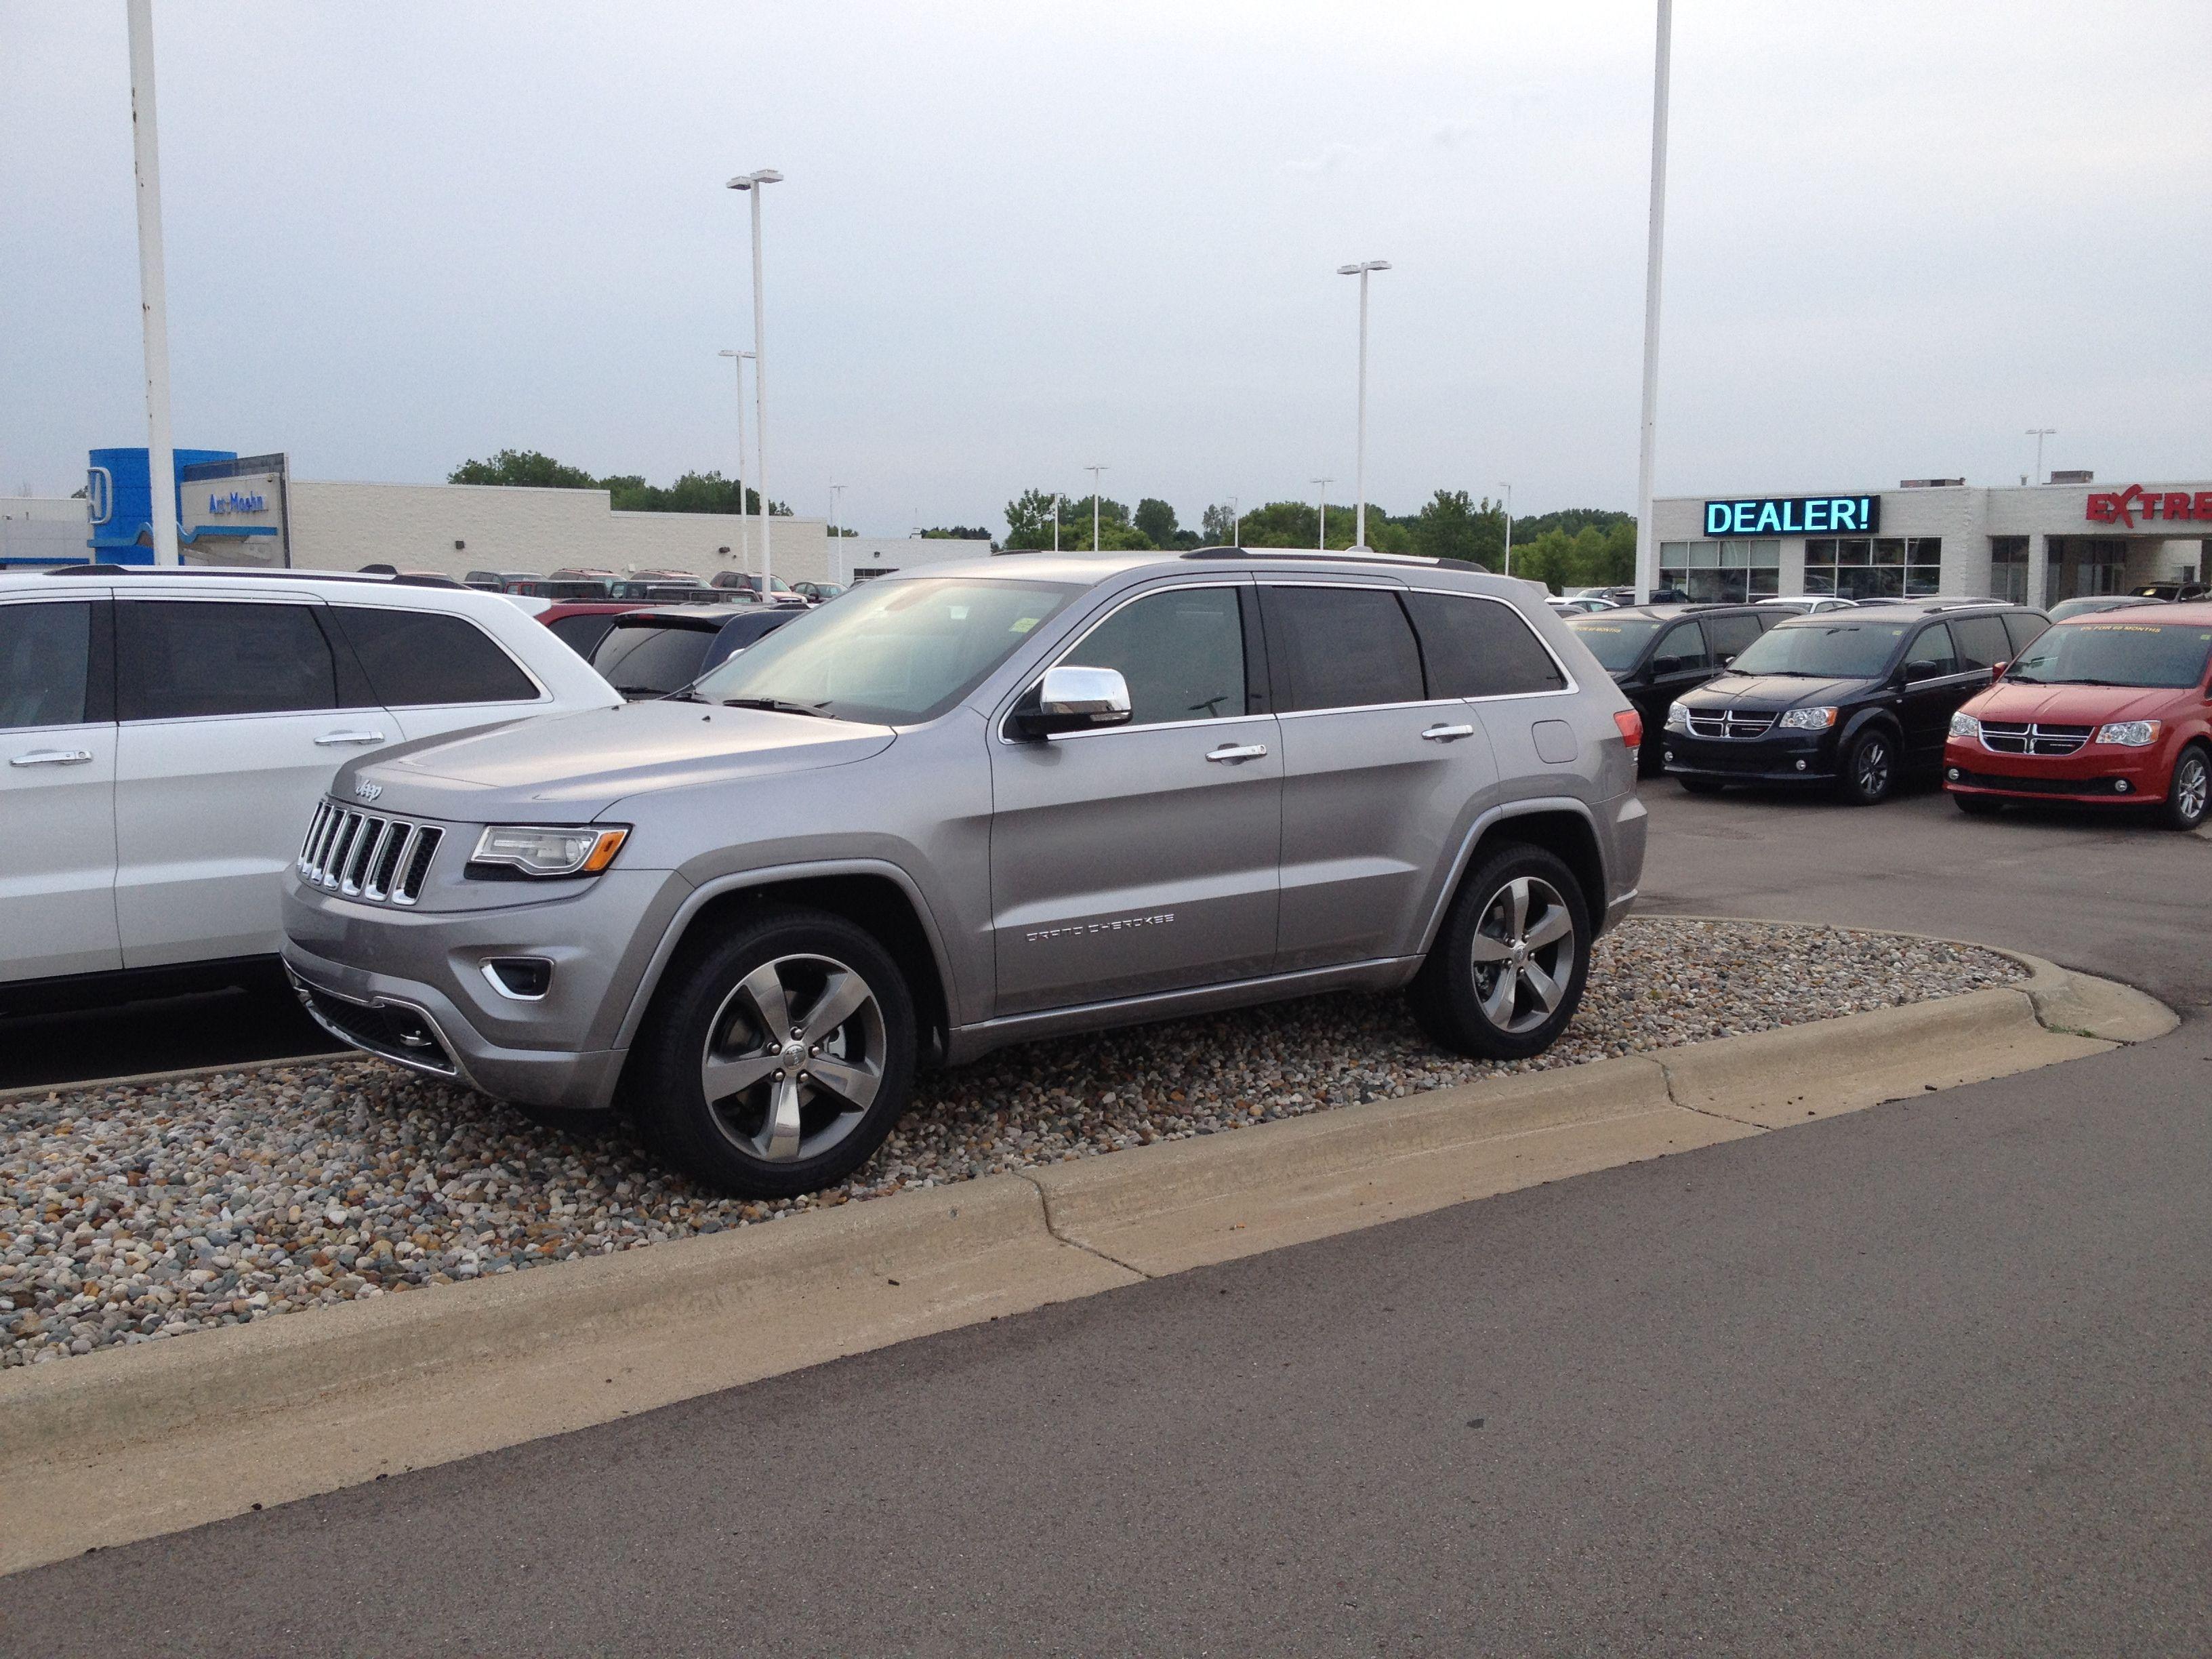 2014 Jeep Grand Cherokee Overland Billet Silver Grand Cherokee